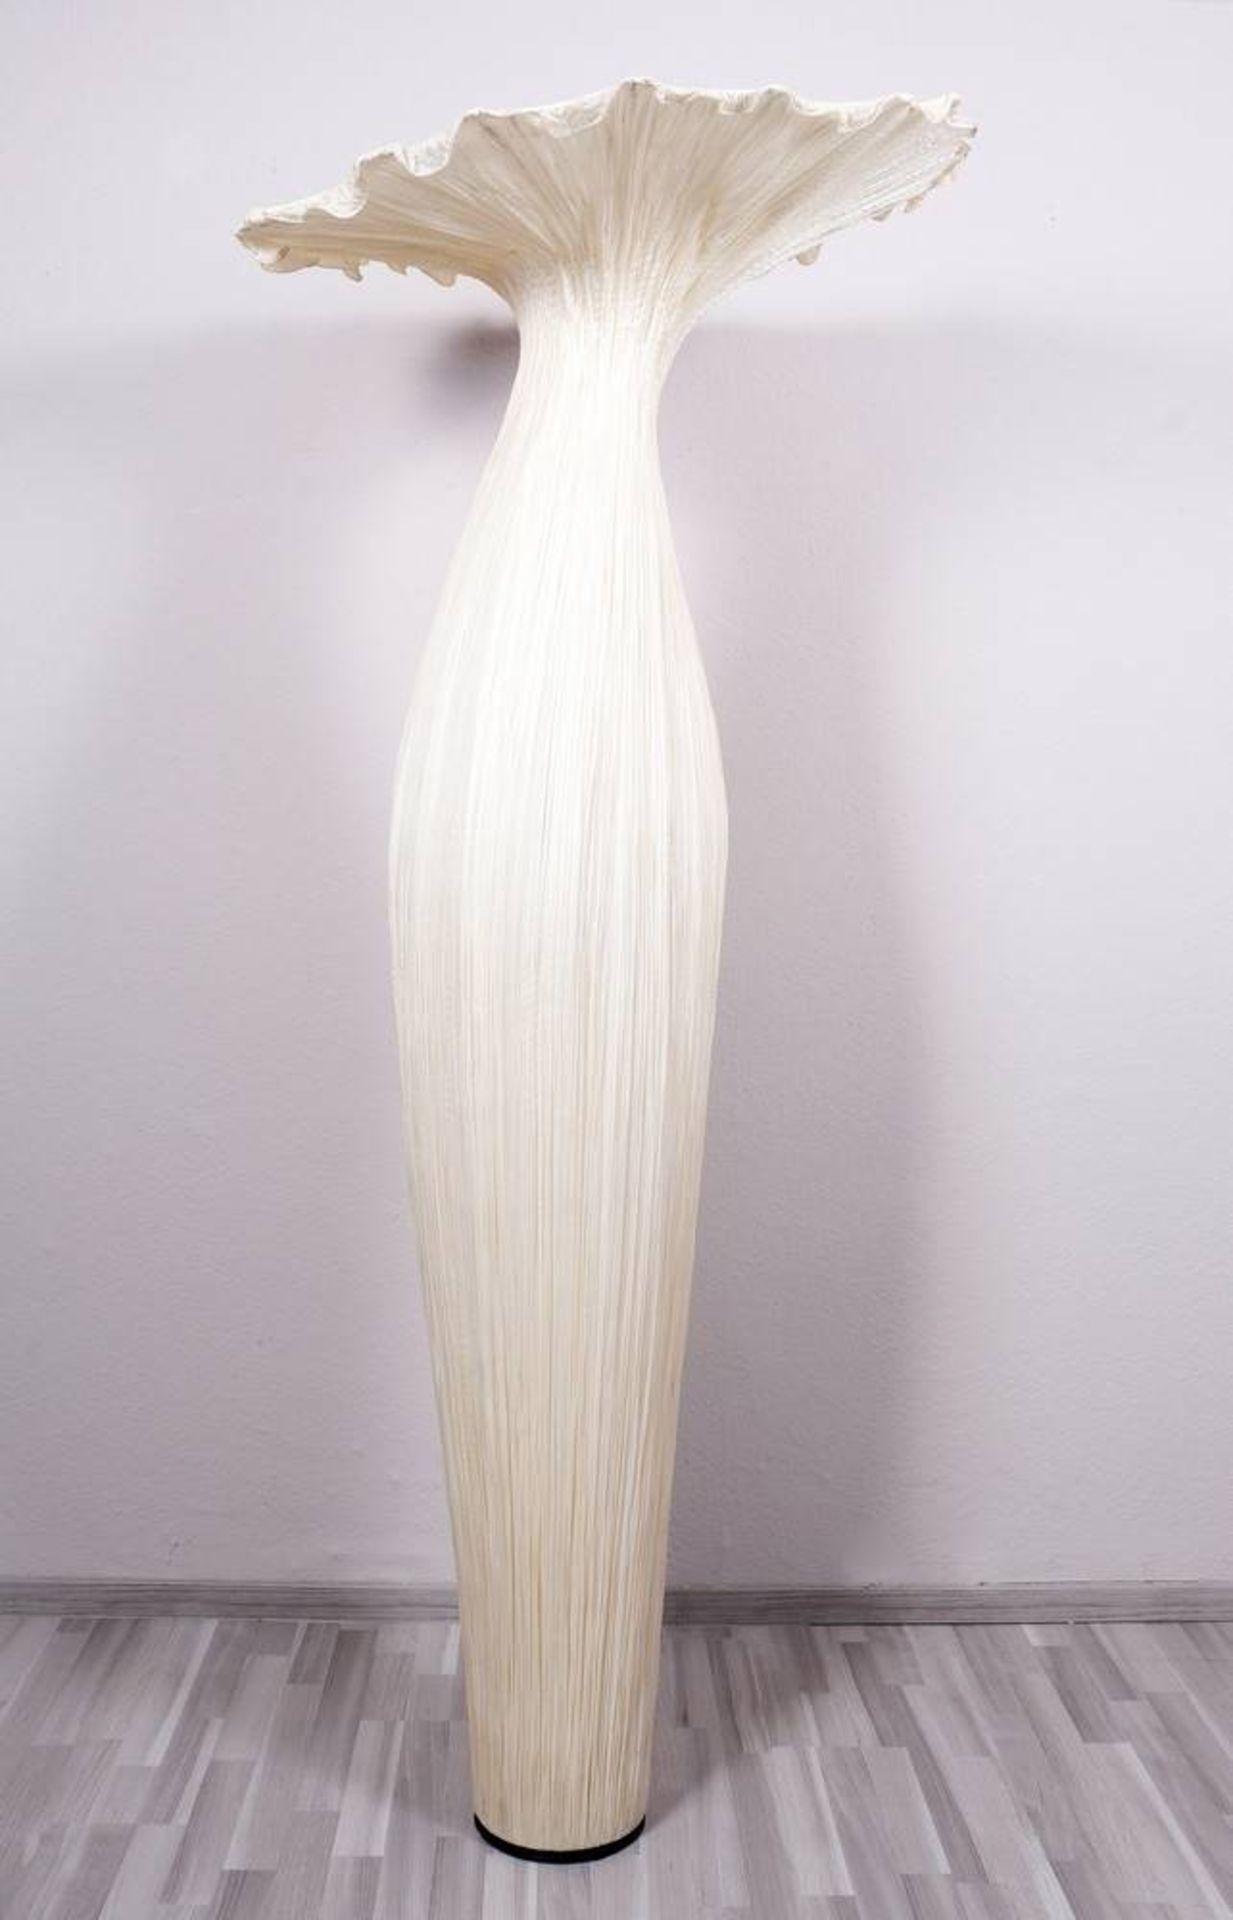 Large floor lamp, design Ayala Serfaty (born 1962, Tel Aviv) for Aqua Creations, 1994